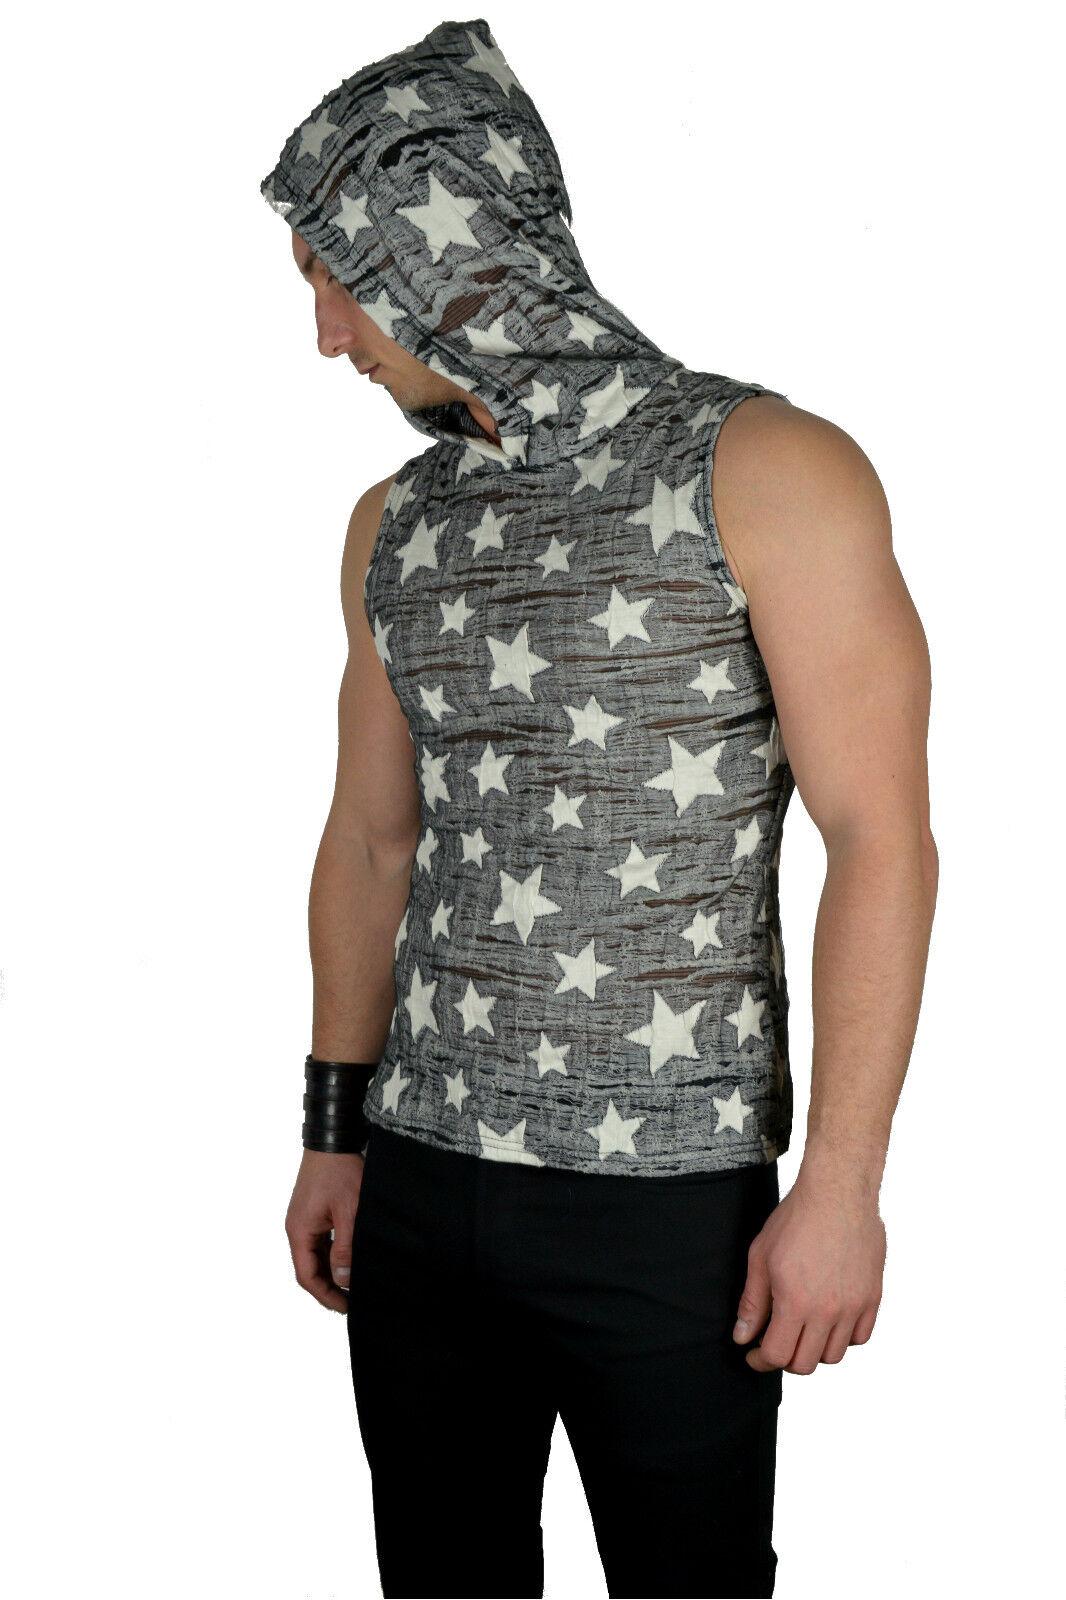 SHRINE DECAYED STARS ROCK GOTHIC CYBER PUNK GOTH STEAMPUNK SHIRT HOODIE ZOMBIE Activewear